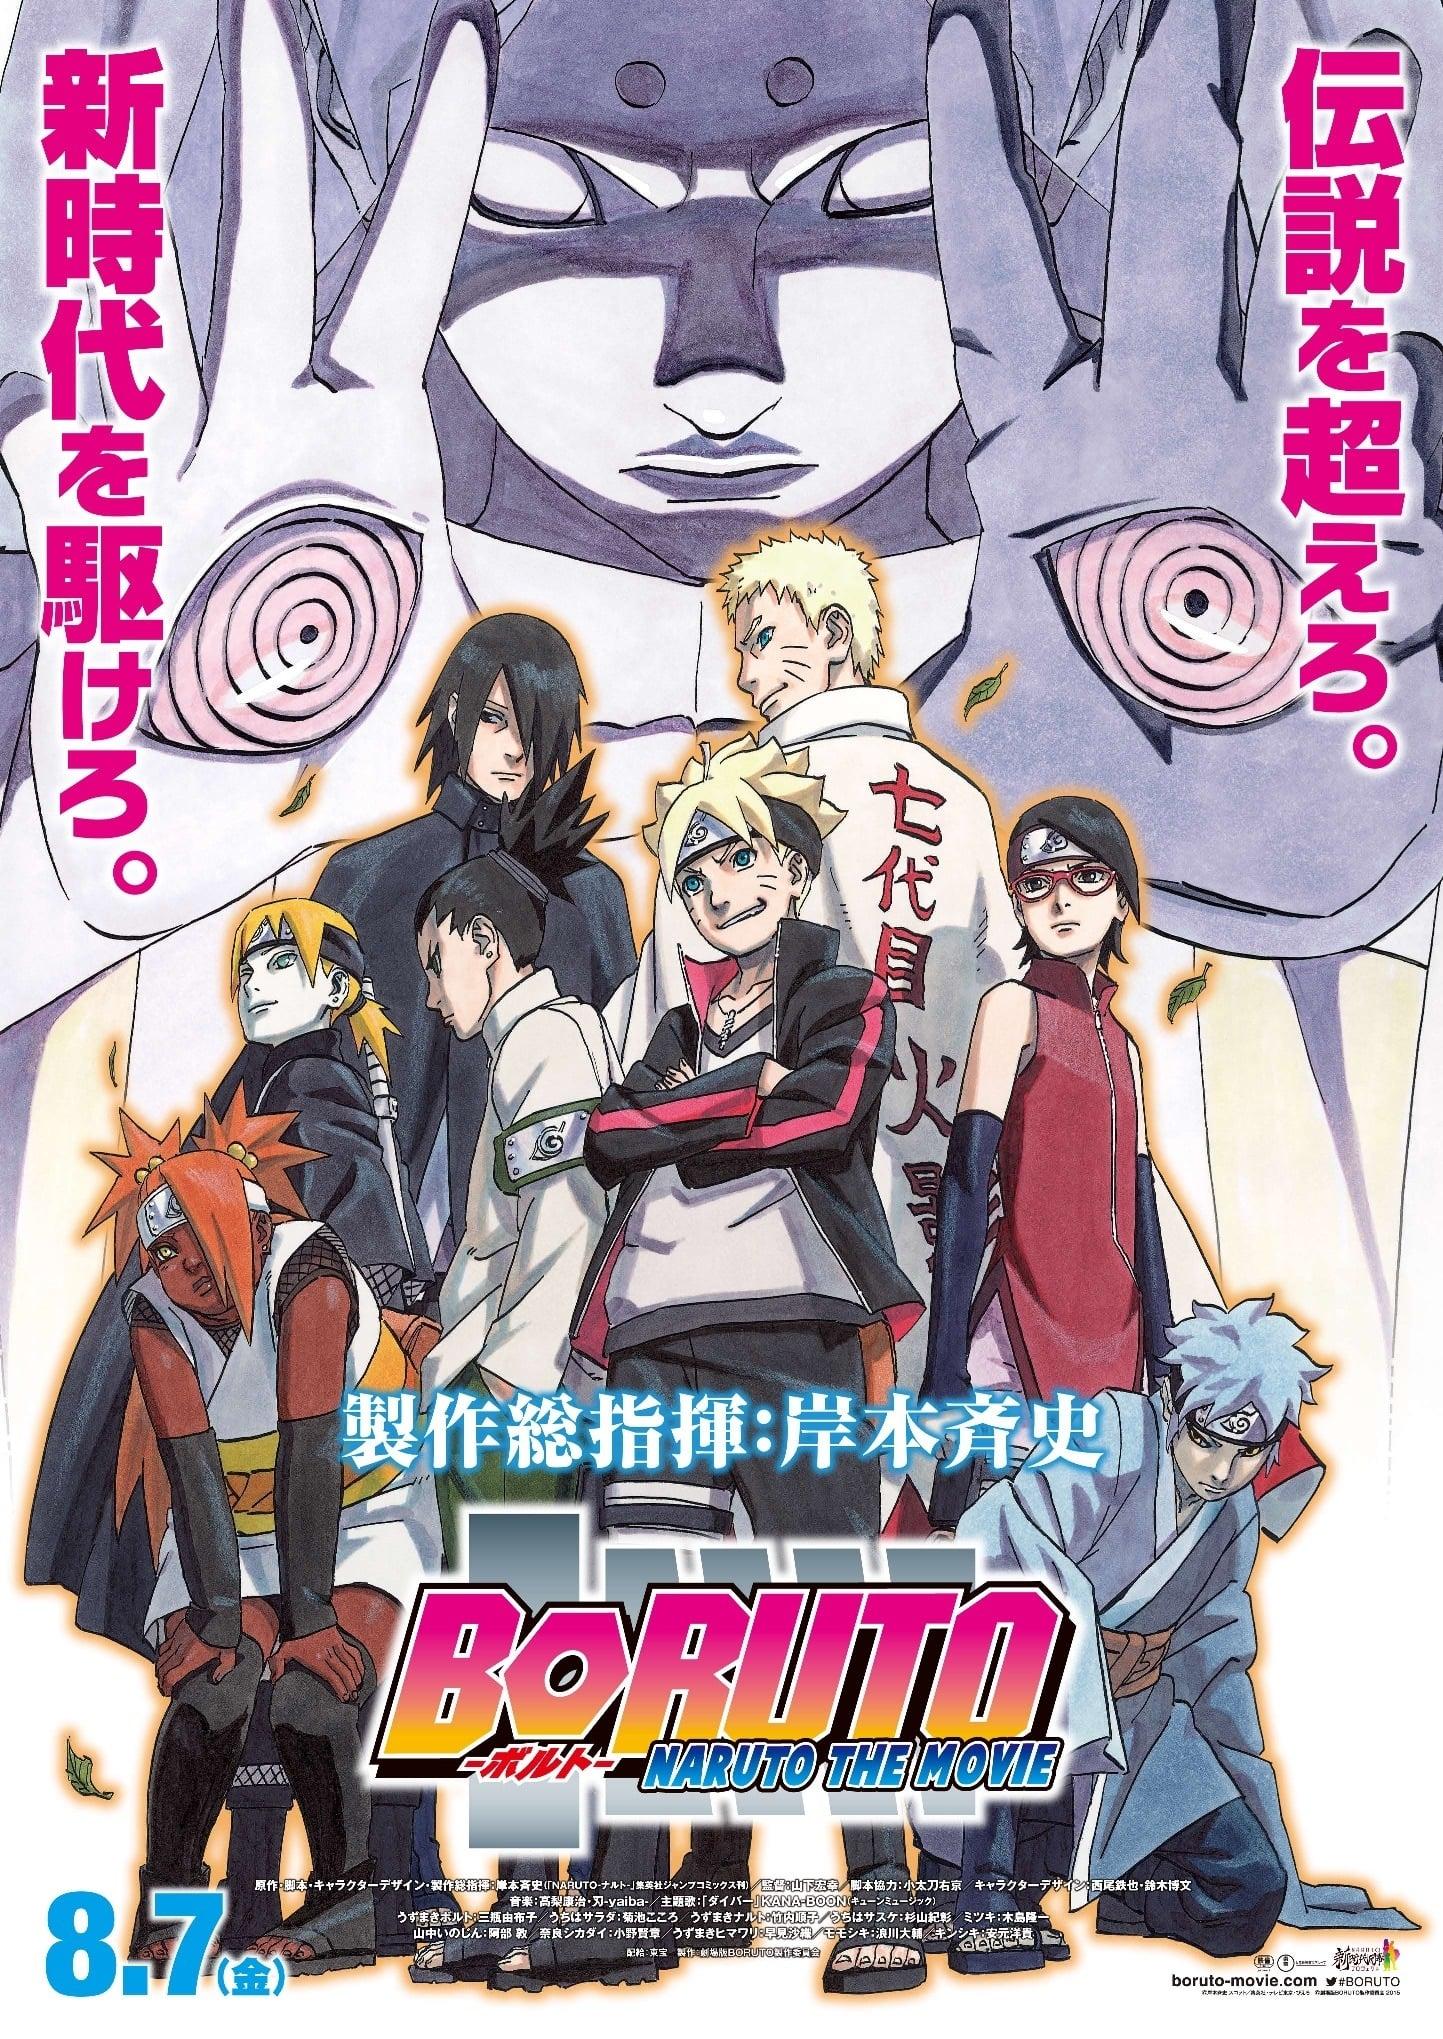 Boruto: Naruto Next Generations Season 0